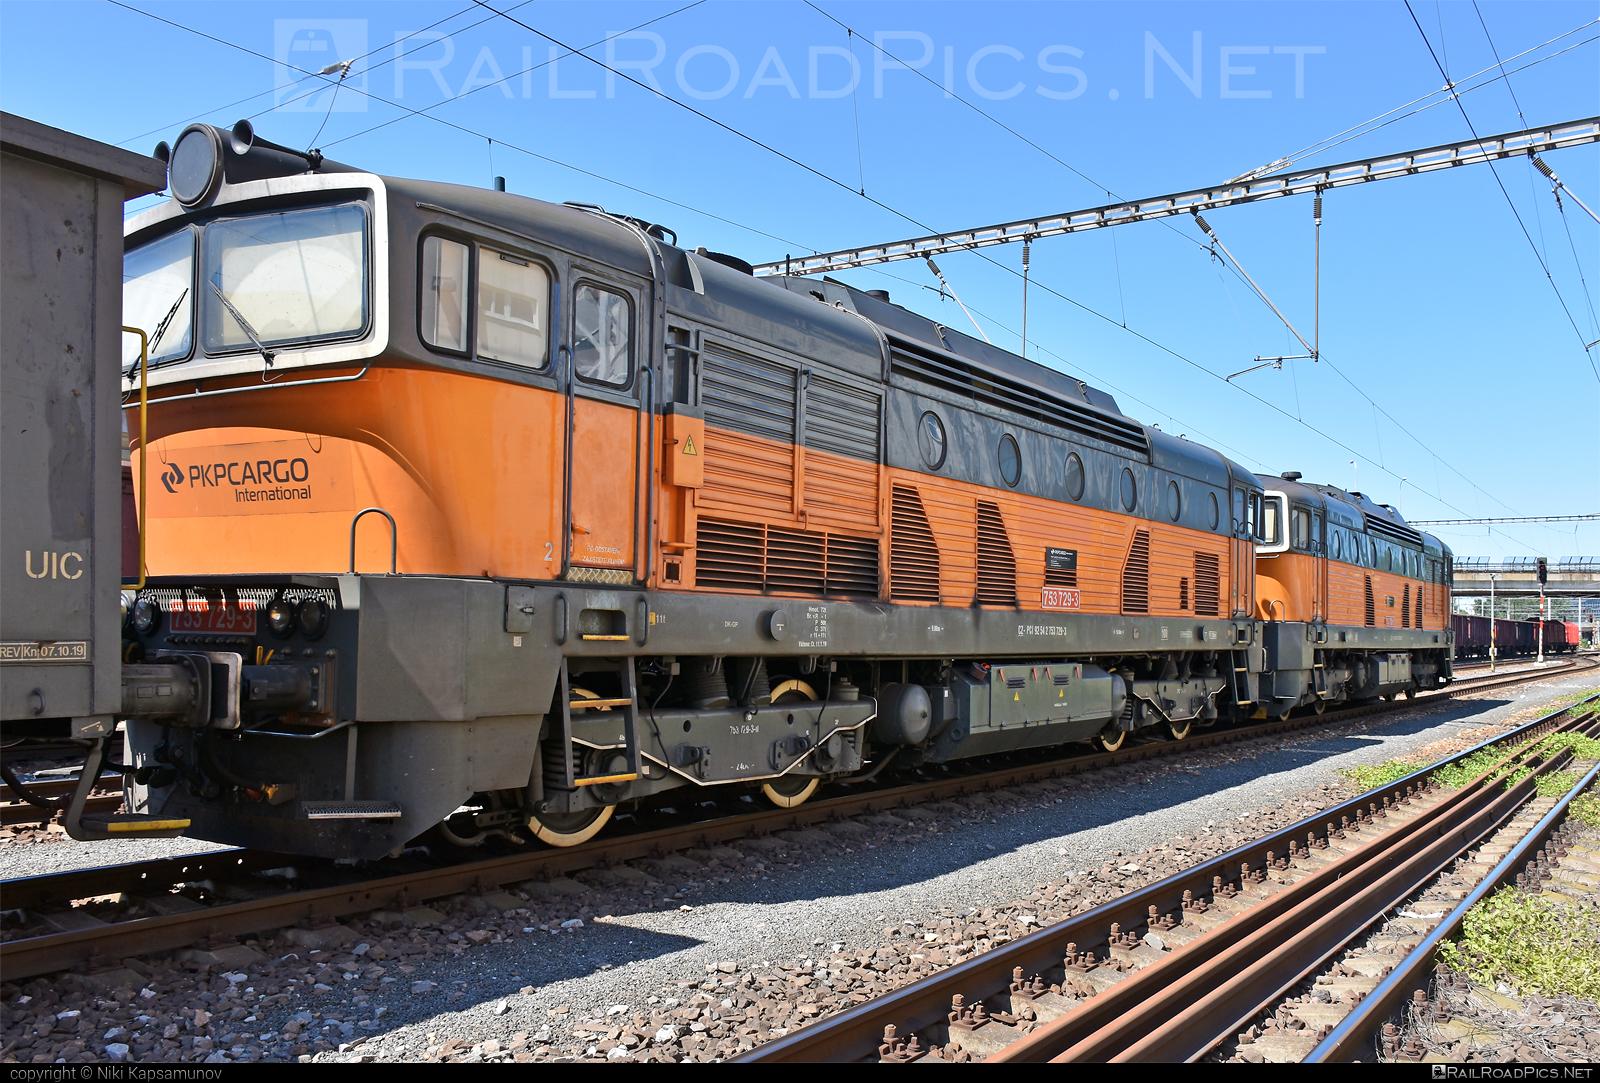 ČKD T 478.3 (753) - 753 729-3 operated by PKP CARGO INTERNATIONAL a.s. #brejlovec #ckd #ckdclass753 #ckdt4783 #locomotive753 #okuliarnik #pkpcargointernational #pkpcargointernationalas #pkpci